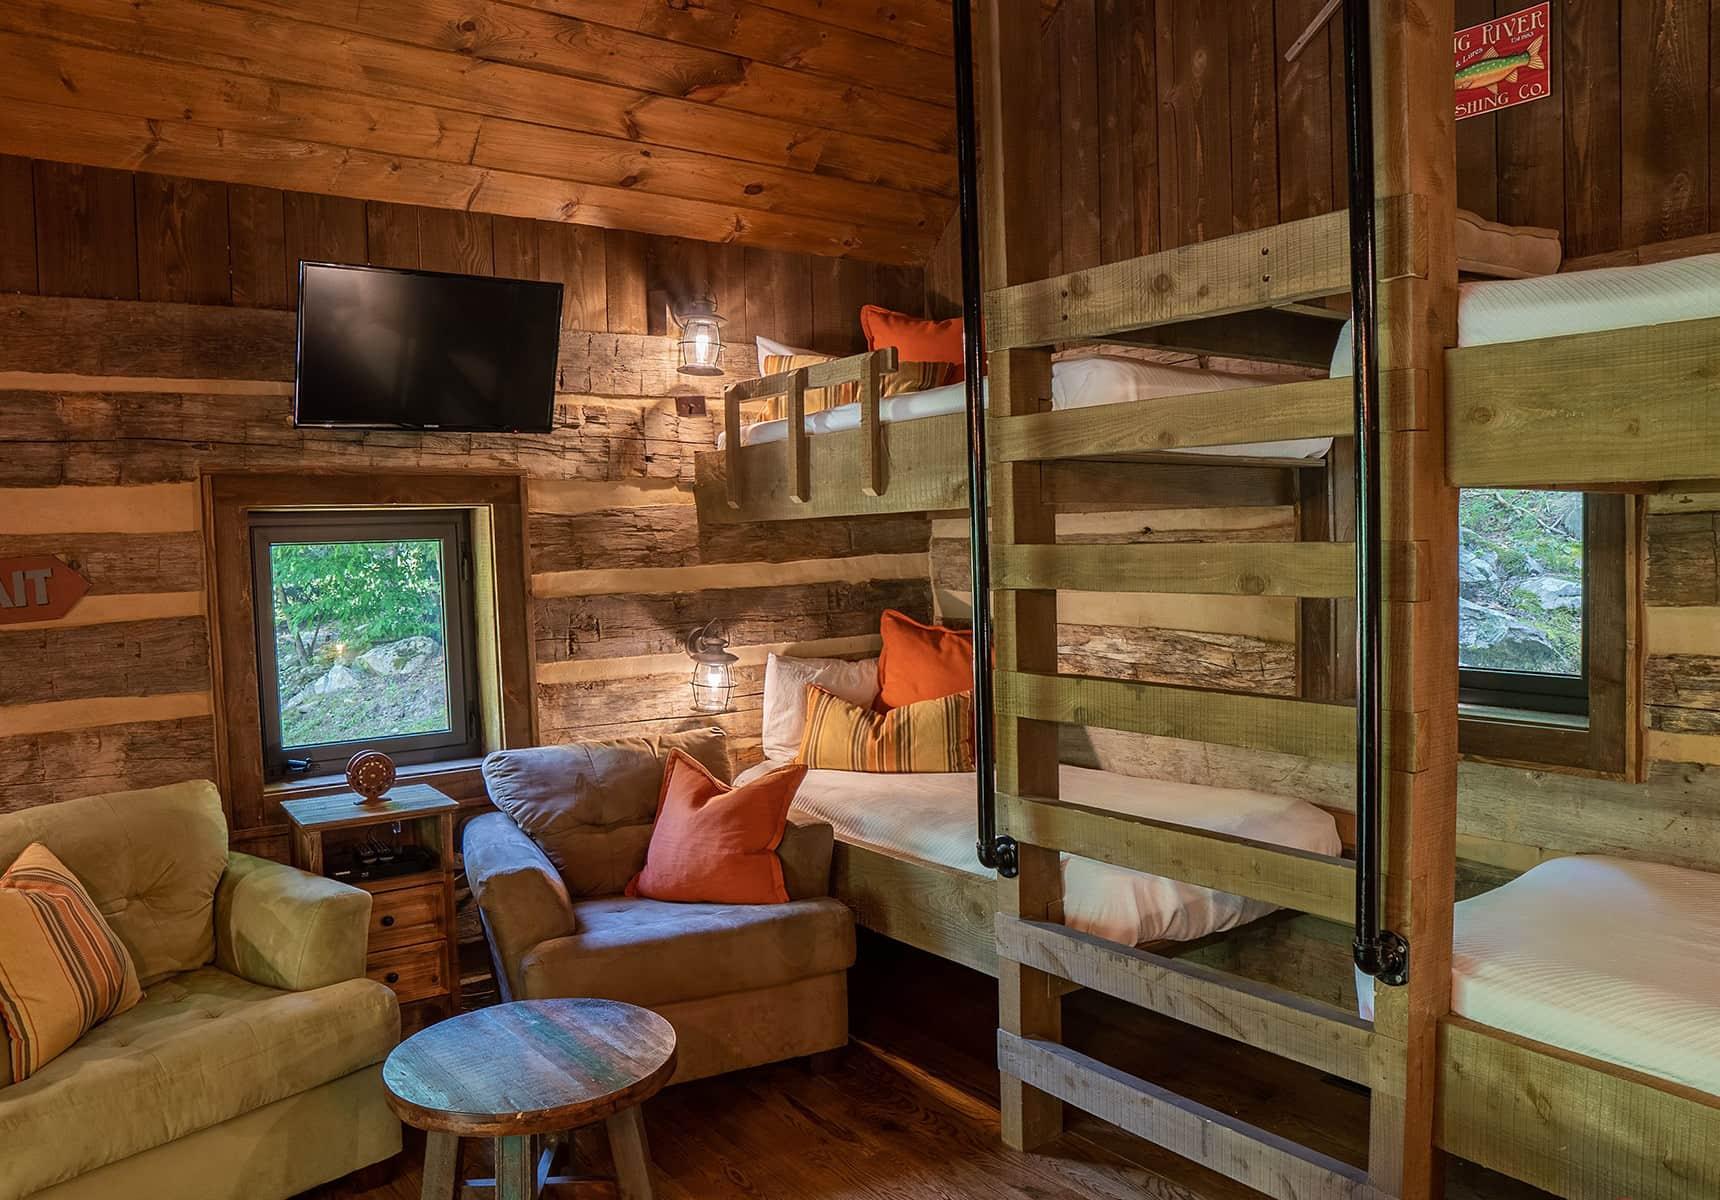 Fishing Creek Cabin seating area and bunks